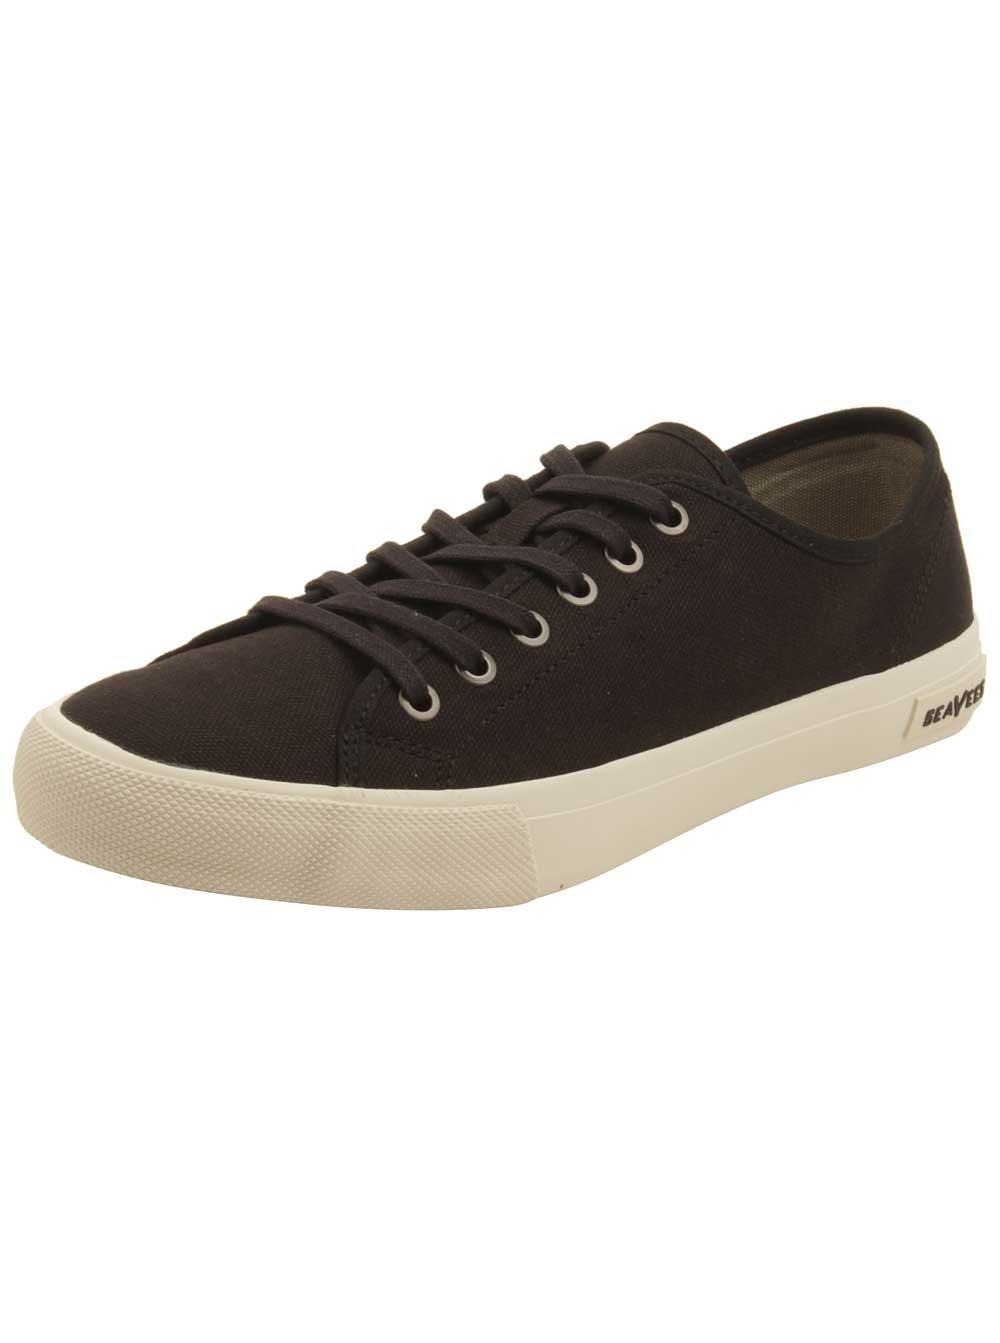 SeaVees Men's Monterey Standard Sneaker B007BQJHQ4 11 D(M) US|Black